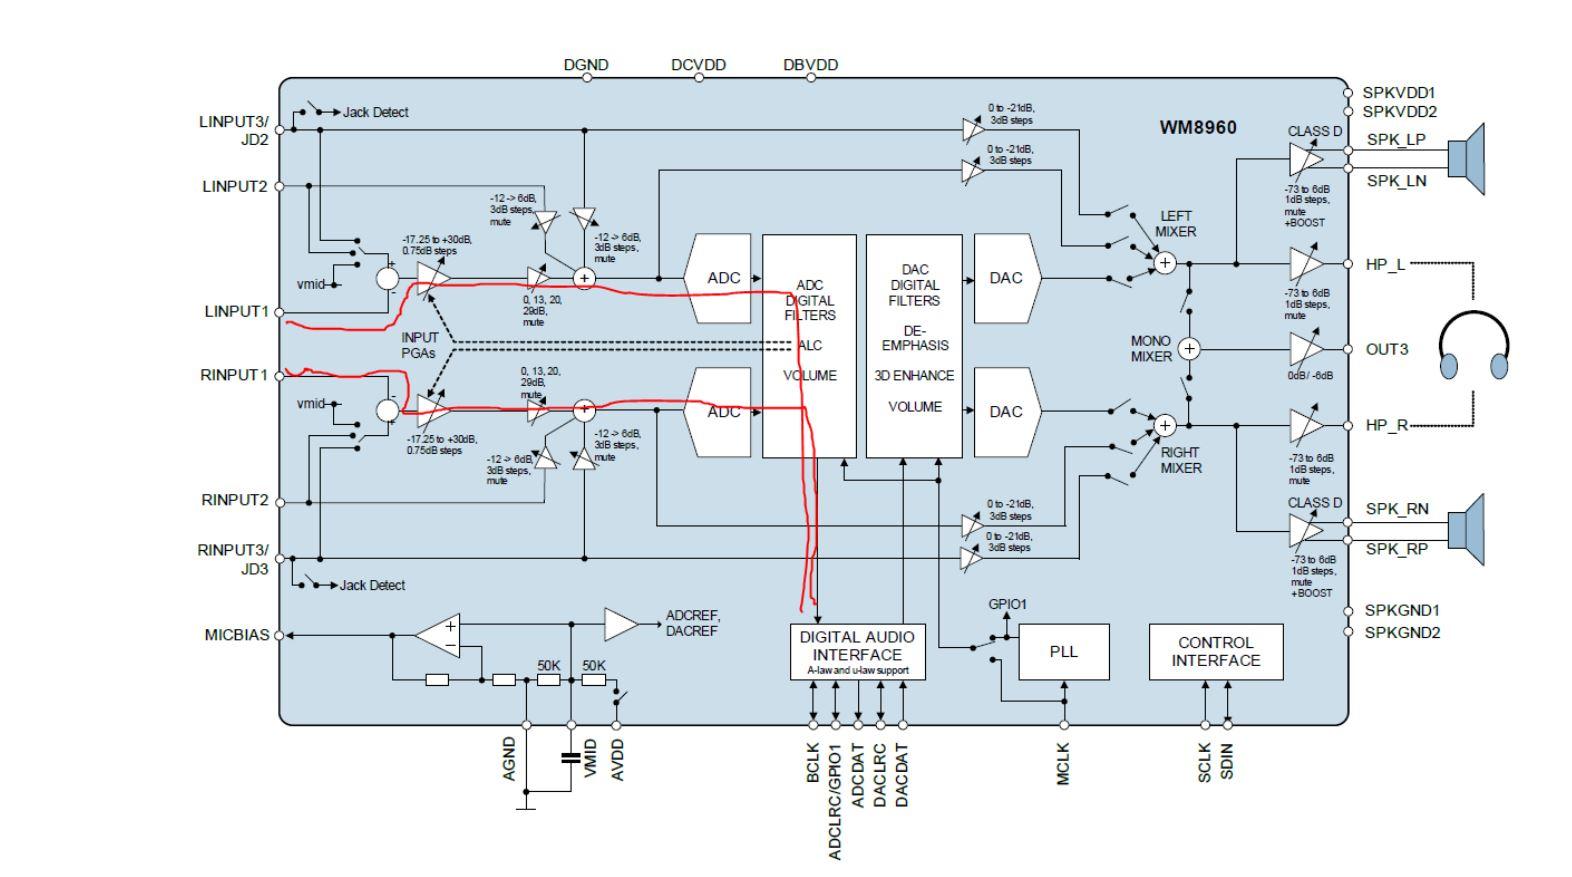 imx6 audio wm8960 microphone path